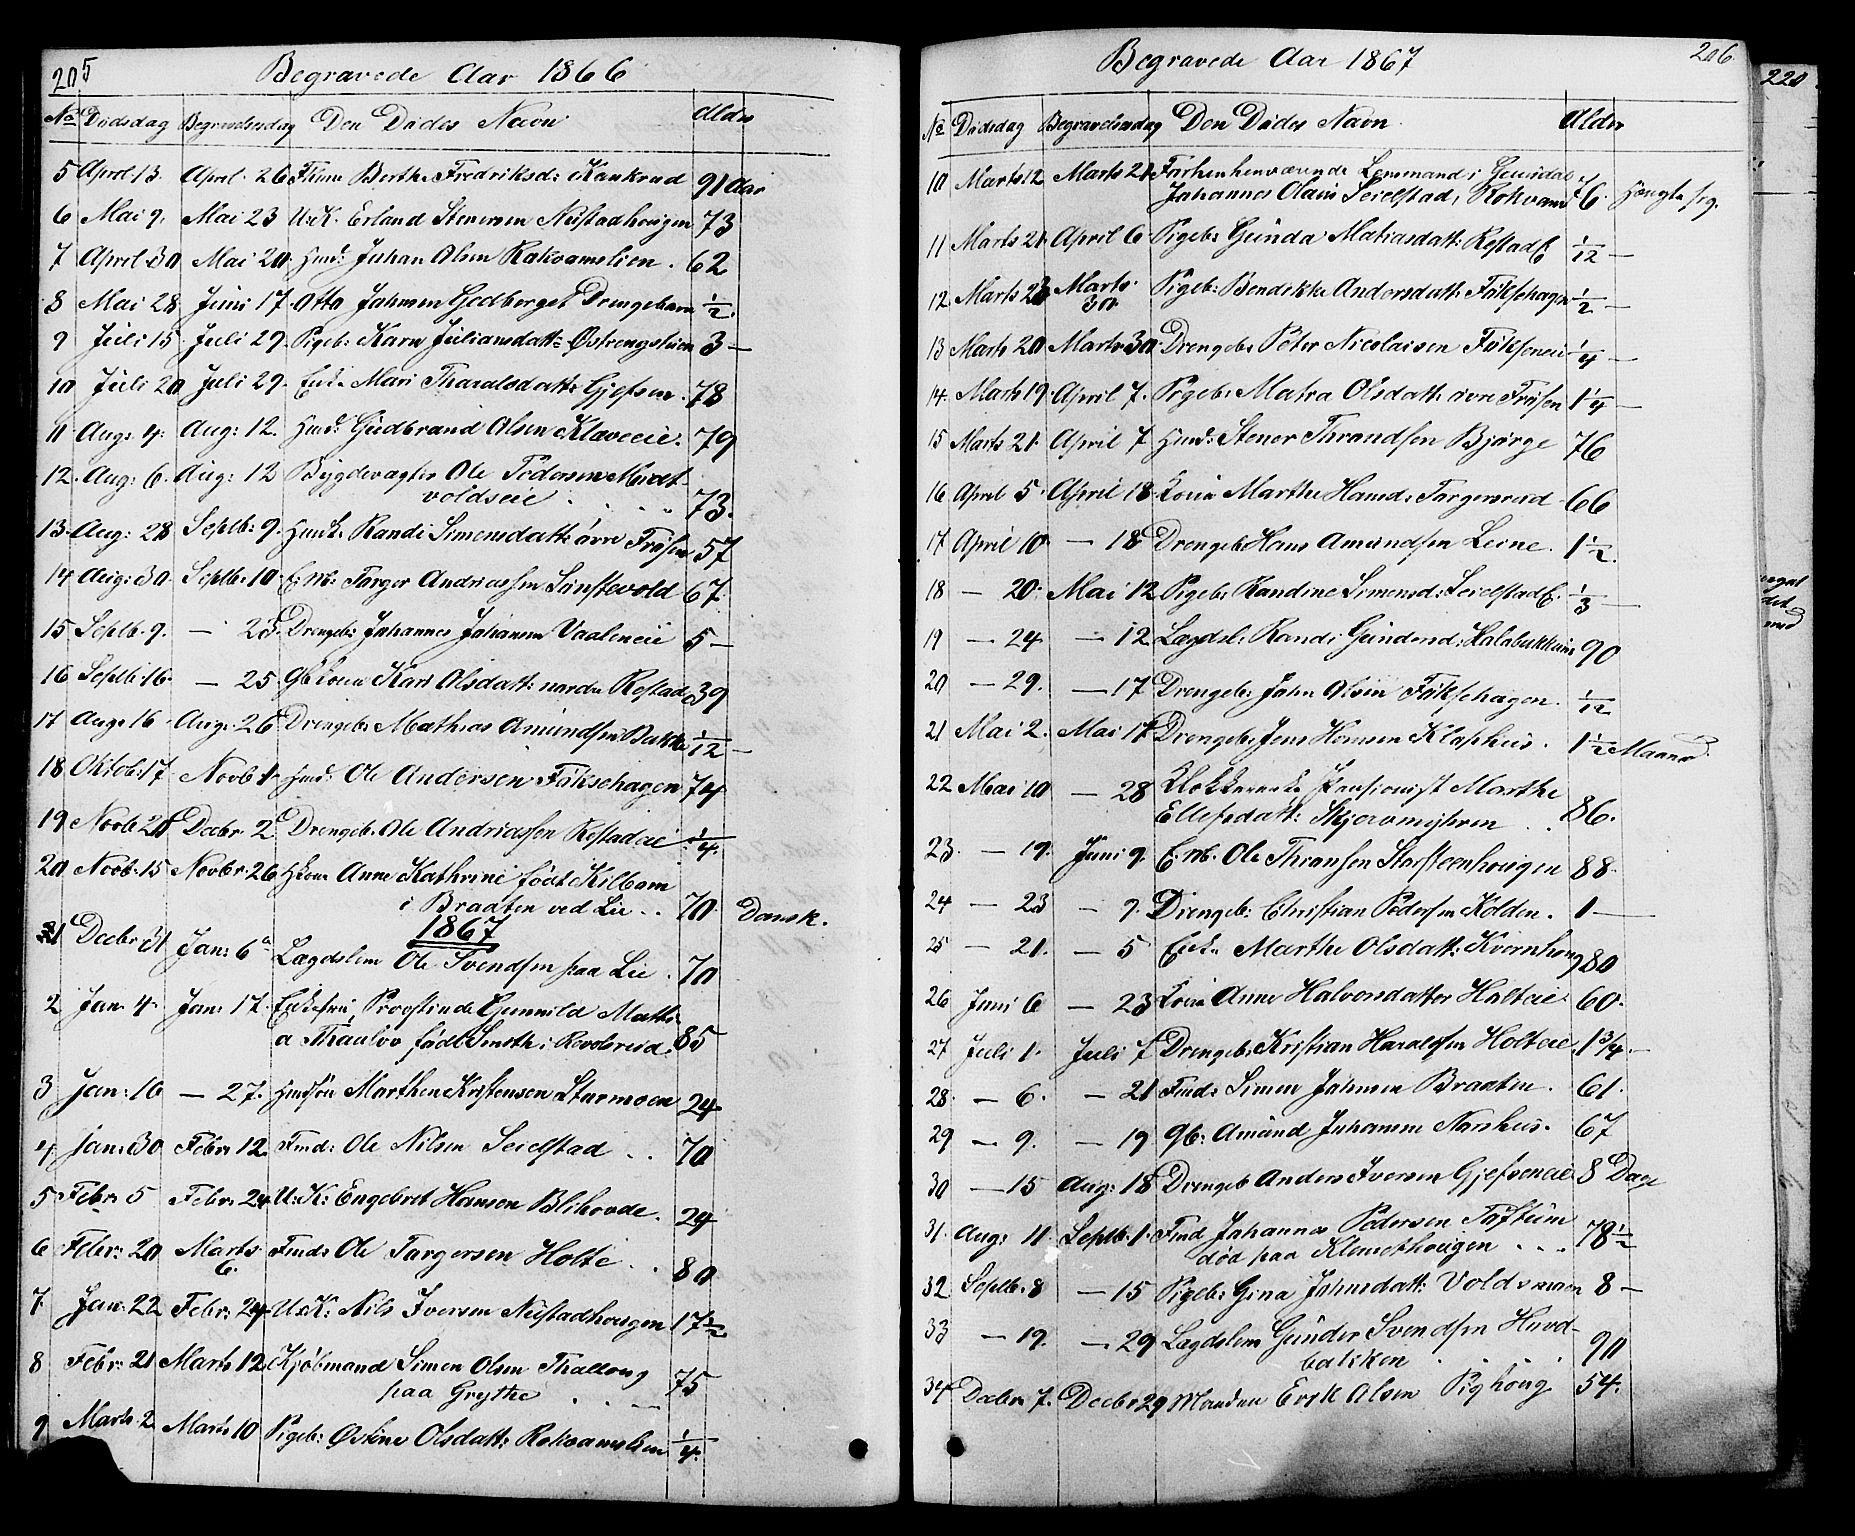 SAH, Østre Gausdal prestekontor, Klokkerbok nr. 1, 1863-1893, s. 205-206